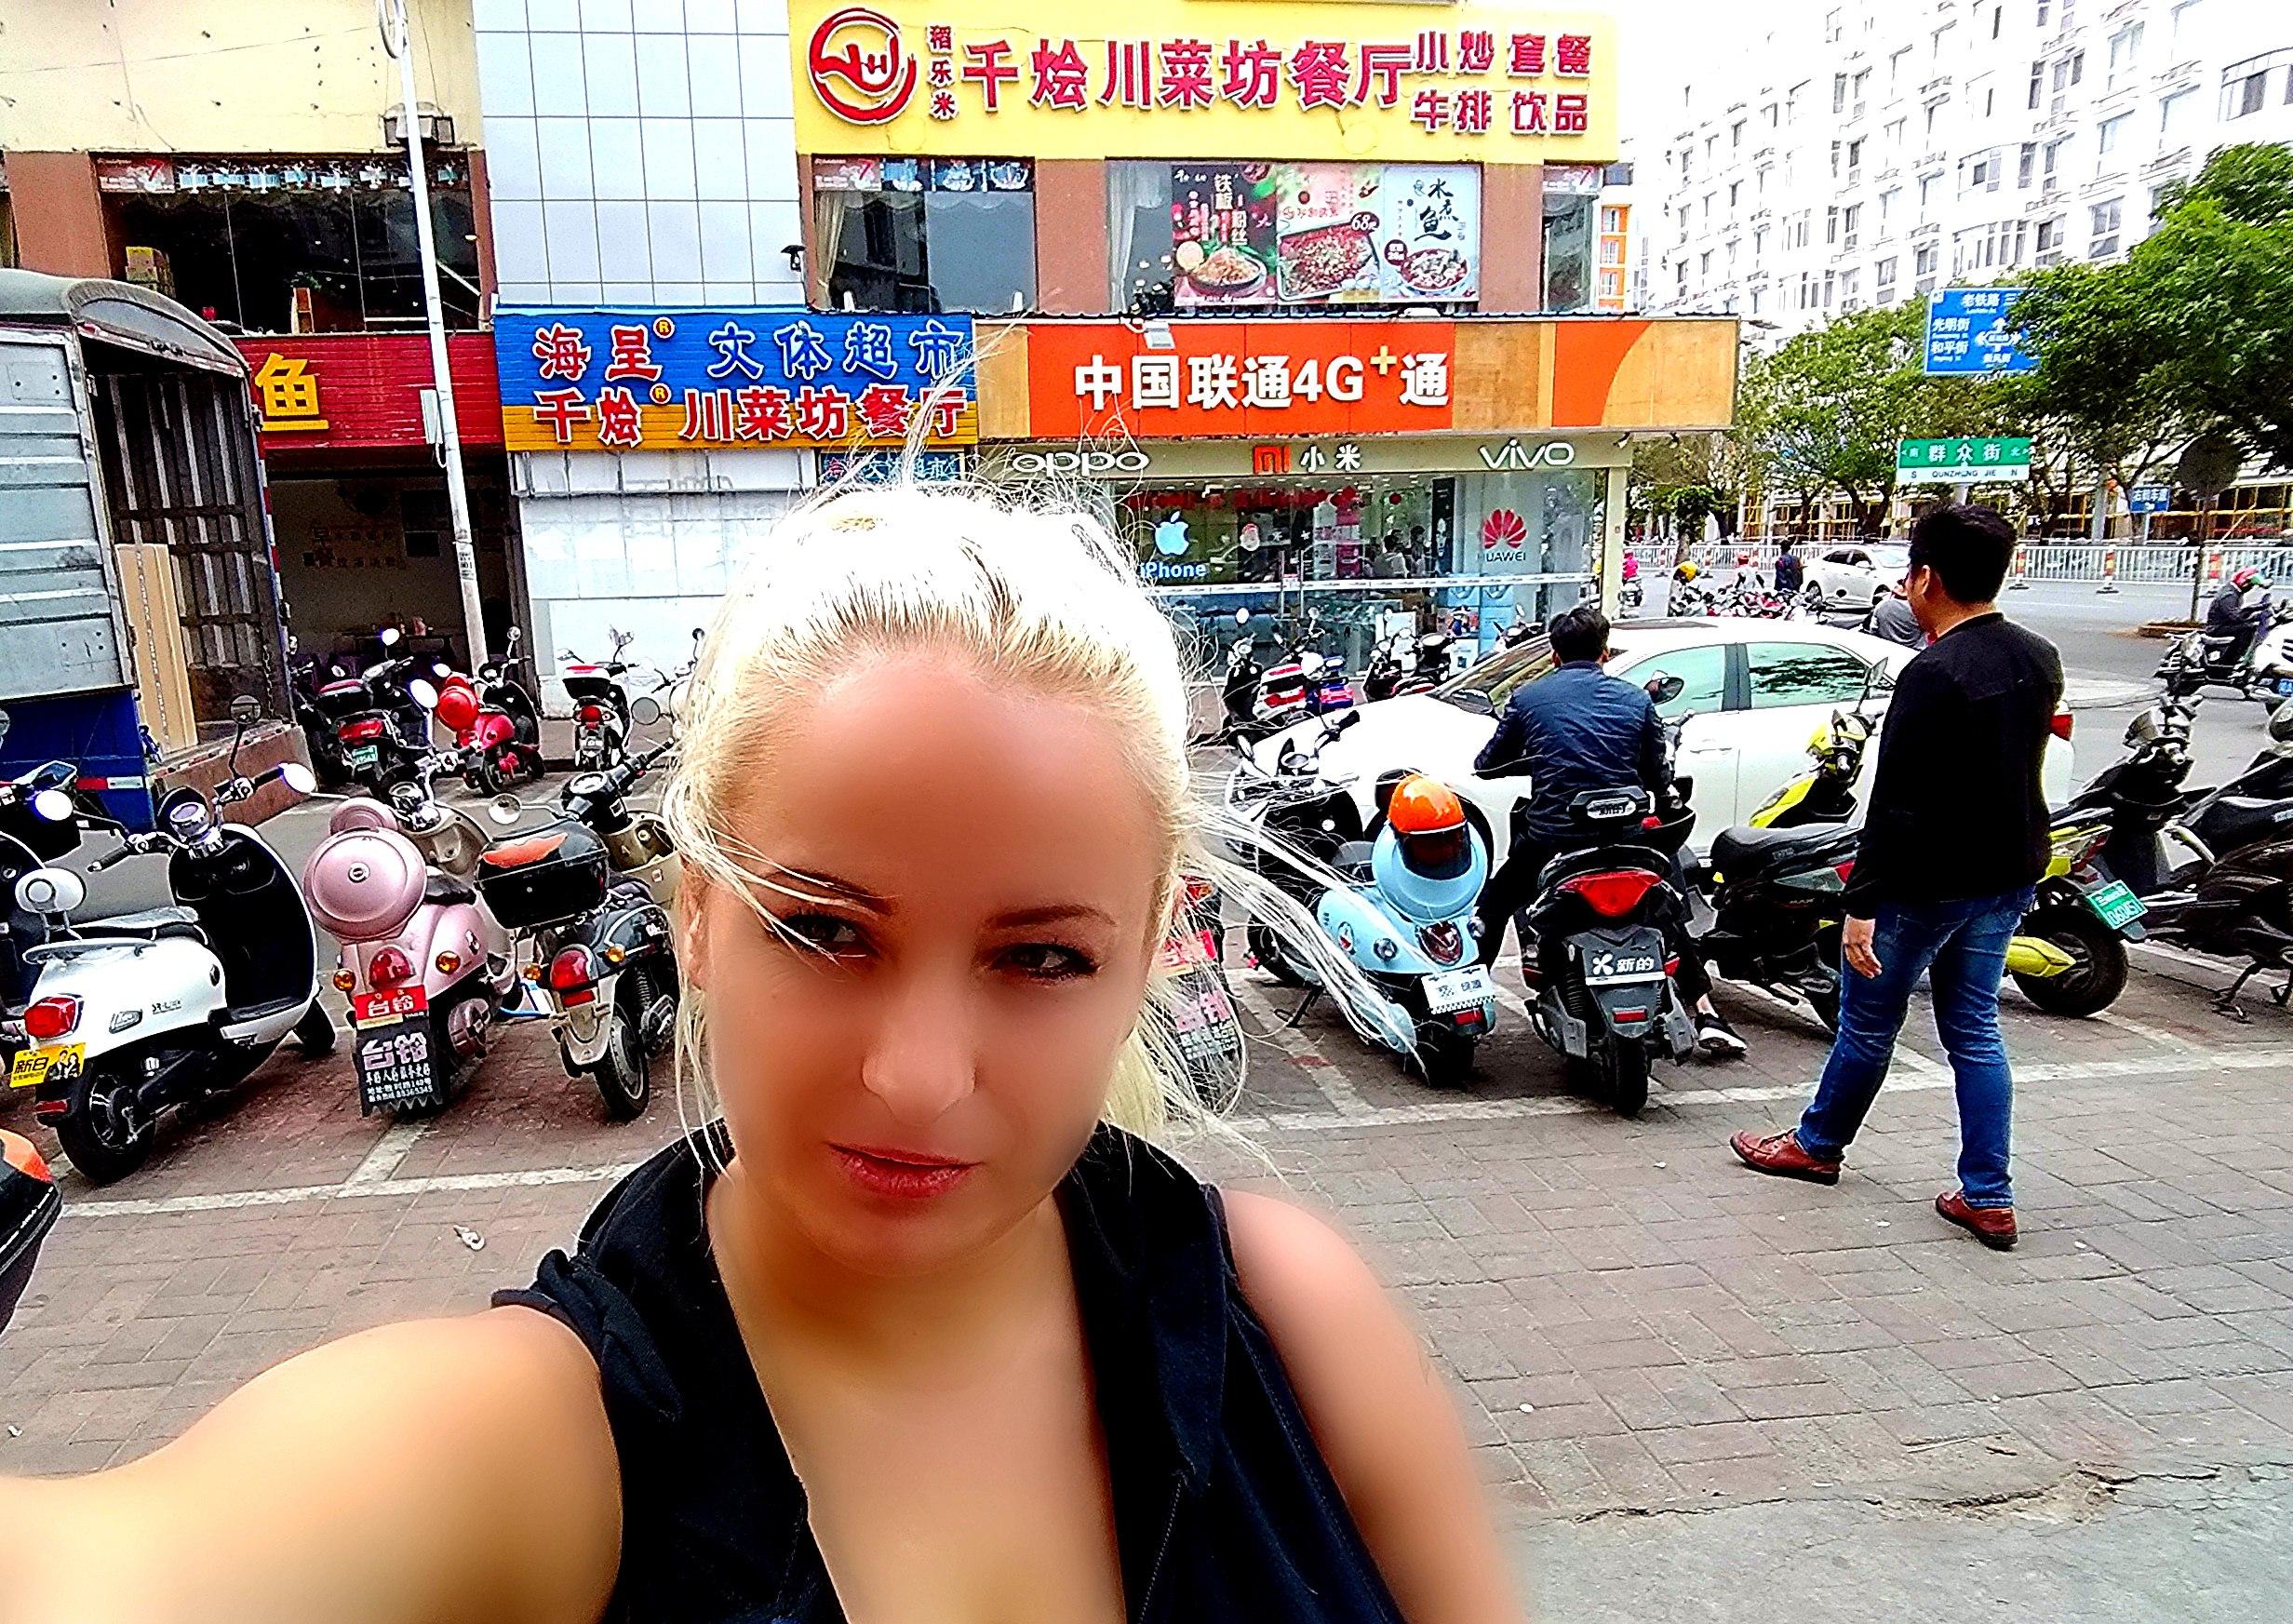 пляж - Елена Руденко. Мои путешествия (фото/видео) - Страница 3 1oPjrJZT_1A